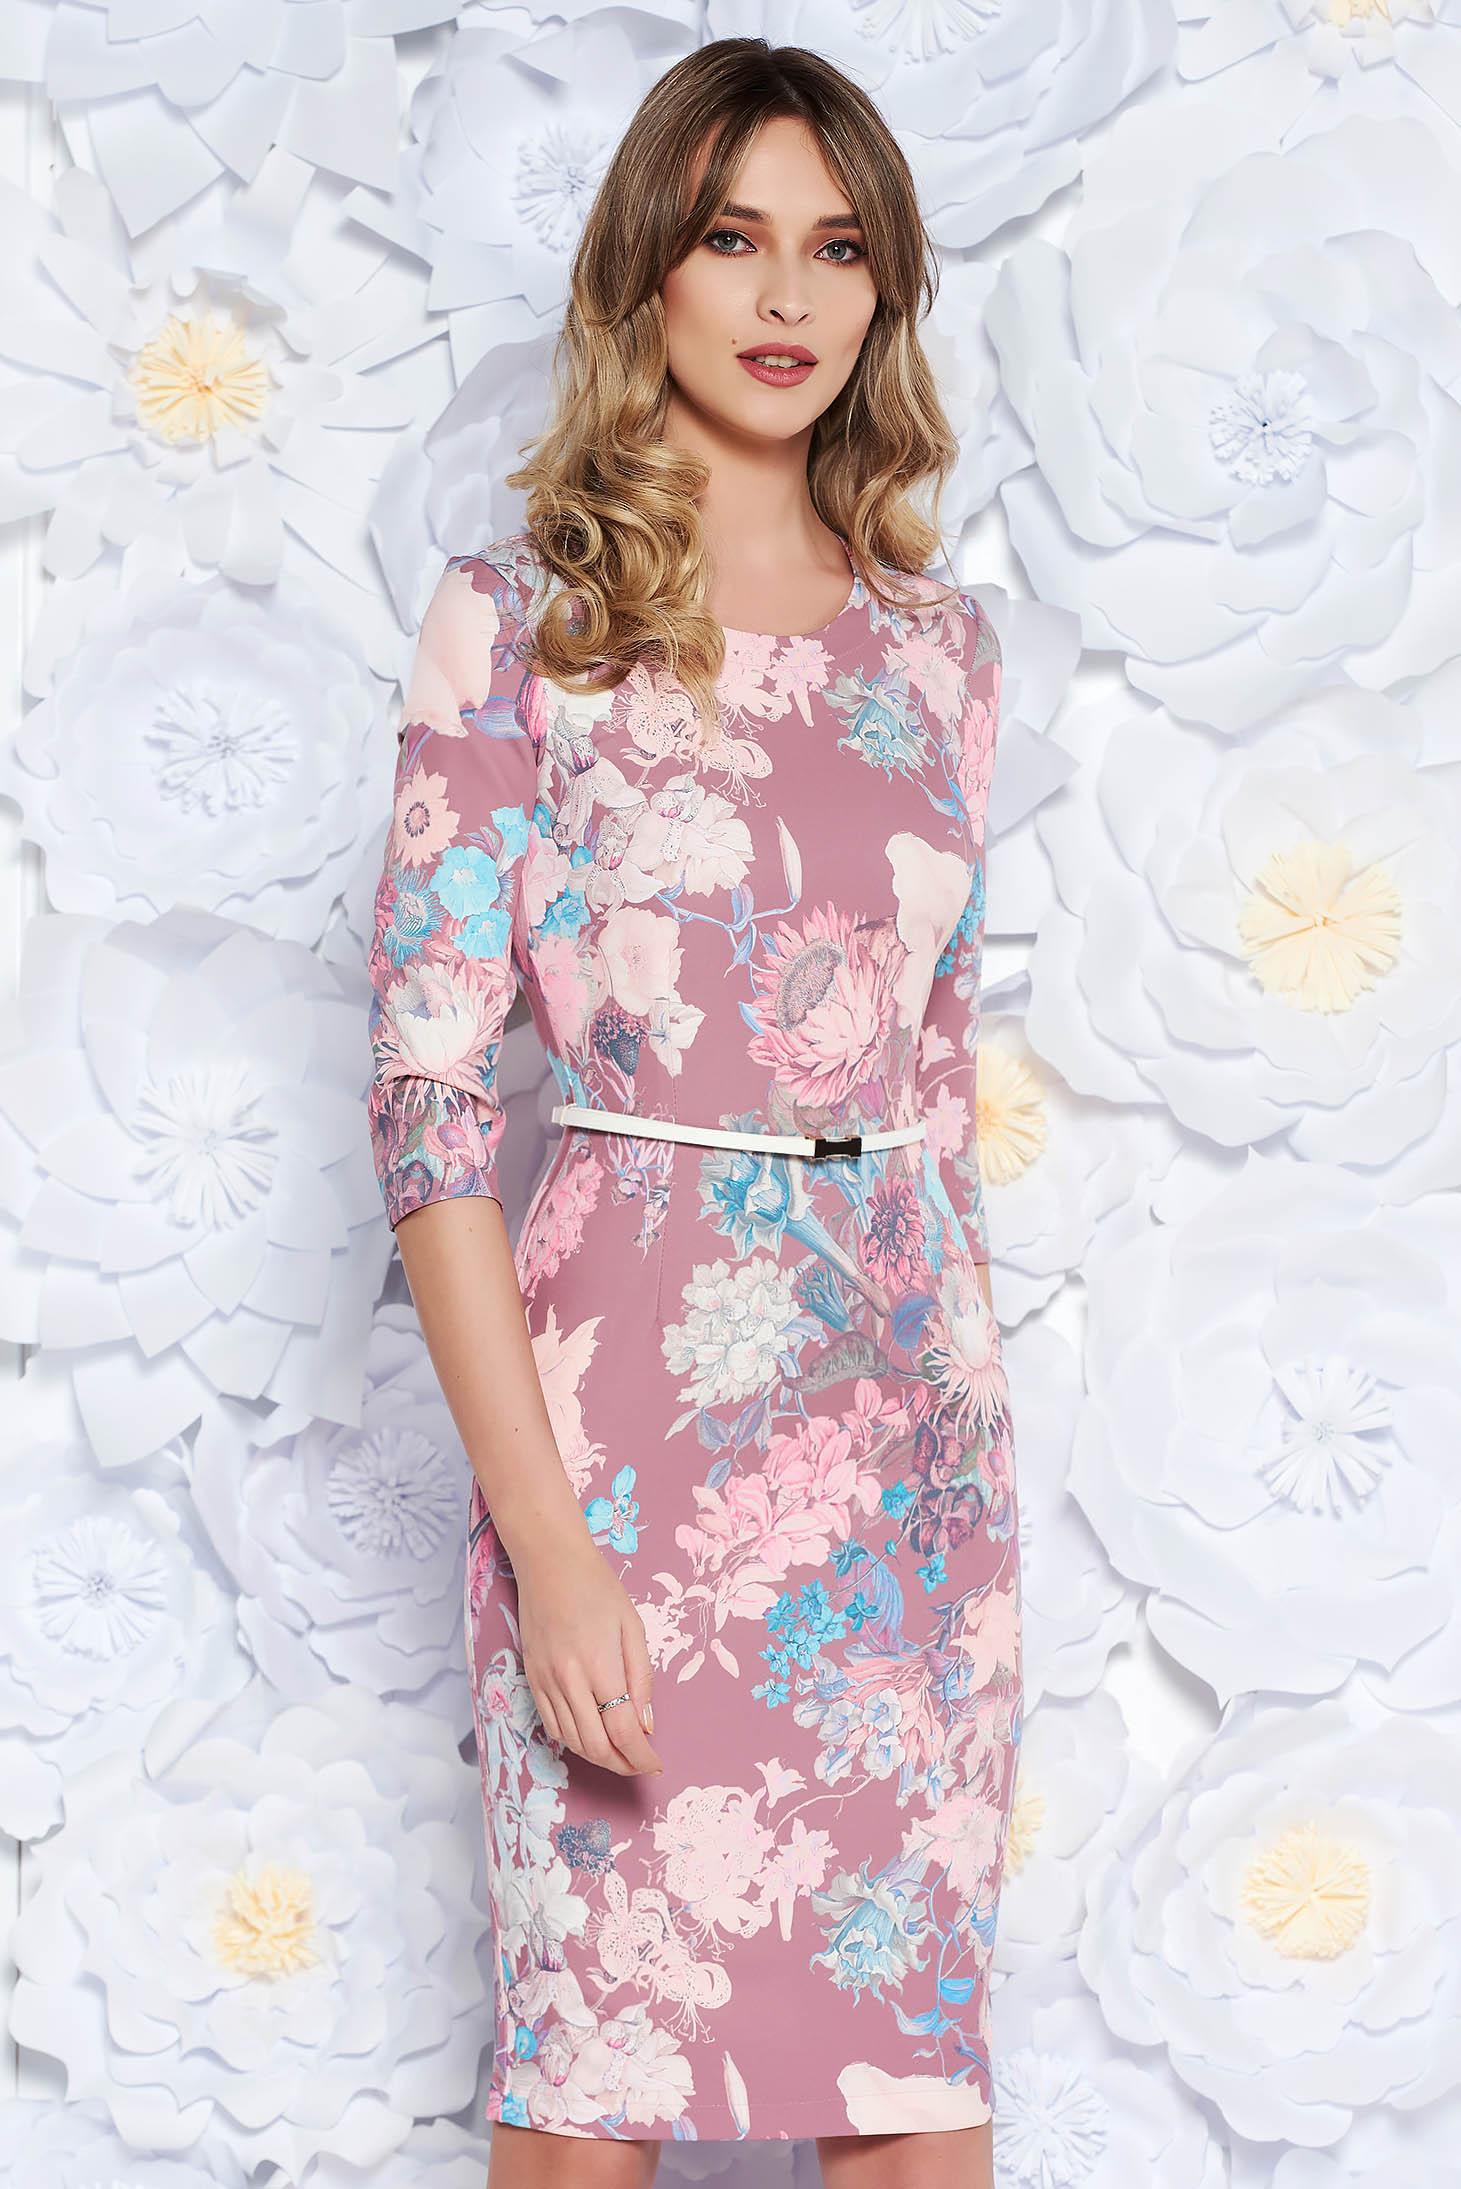 StarShinerS rosa elegant pencil dress slightly elastic fabric accessorized with belt